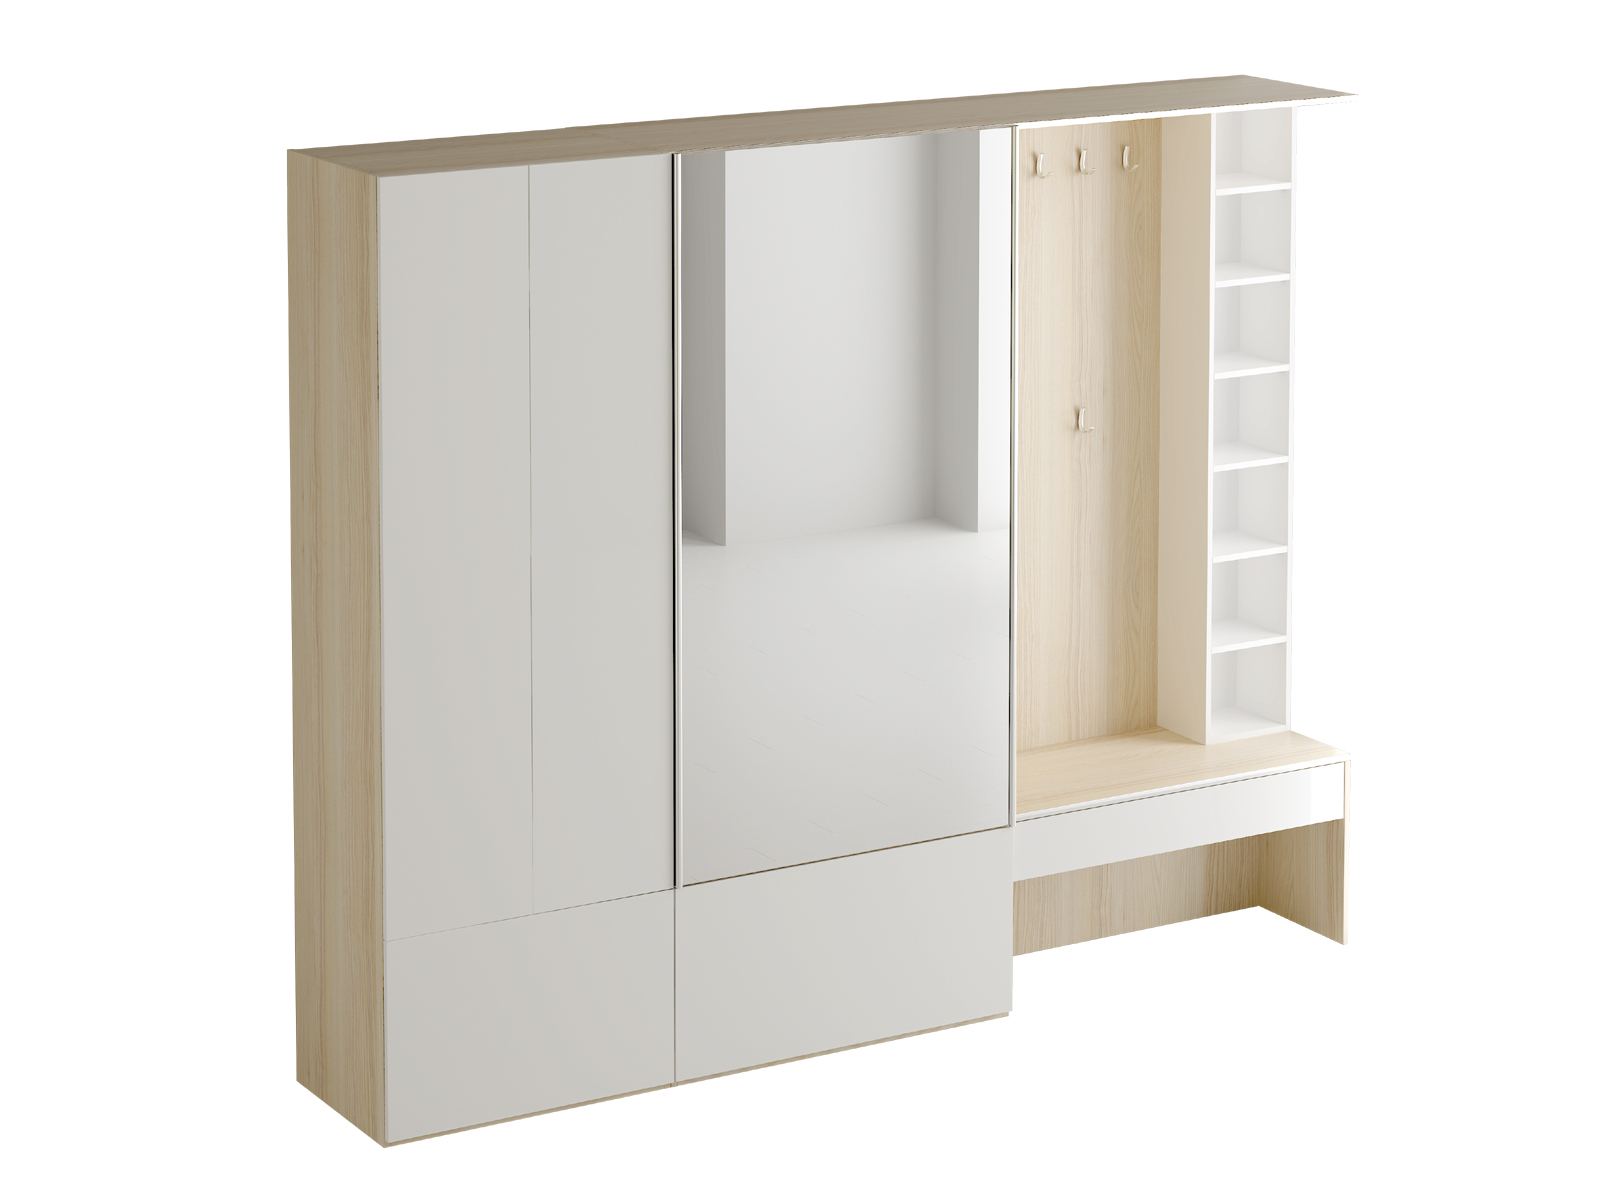 Композиция Passage №2Комплекты мебели<br>&amp;lt;span style=&amp;quot;line-height: 24.9999px;&amp;quot;&amp;gt;Композиция для прихожей.&amp;lt;/span&amp;gt;<br><br>Material: ДСП<br>Width см: 260<br>Depth см: 49<br>Height см: 210